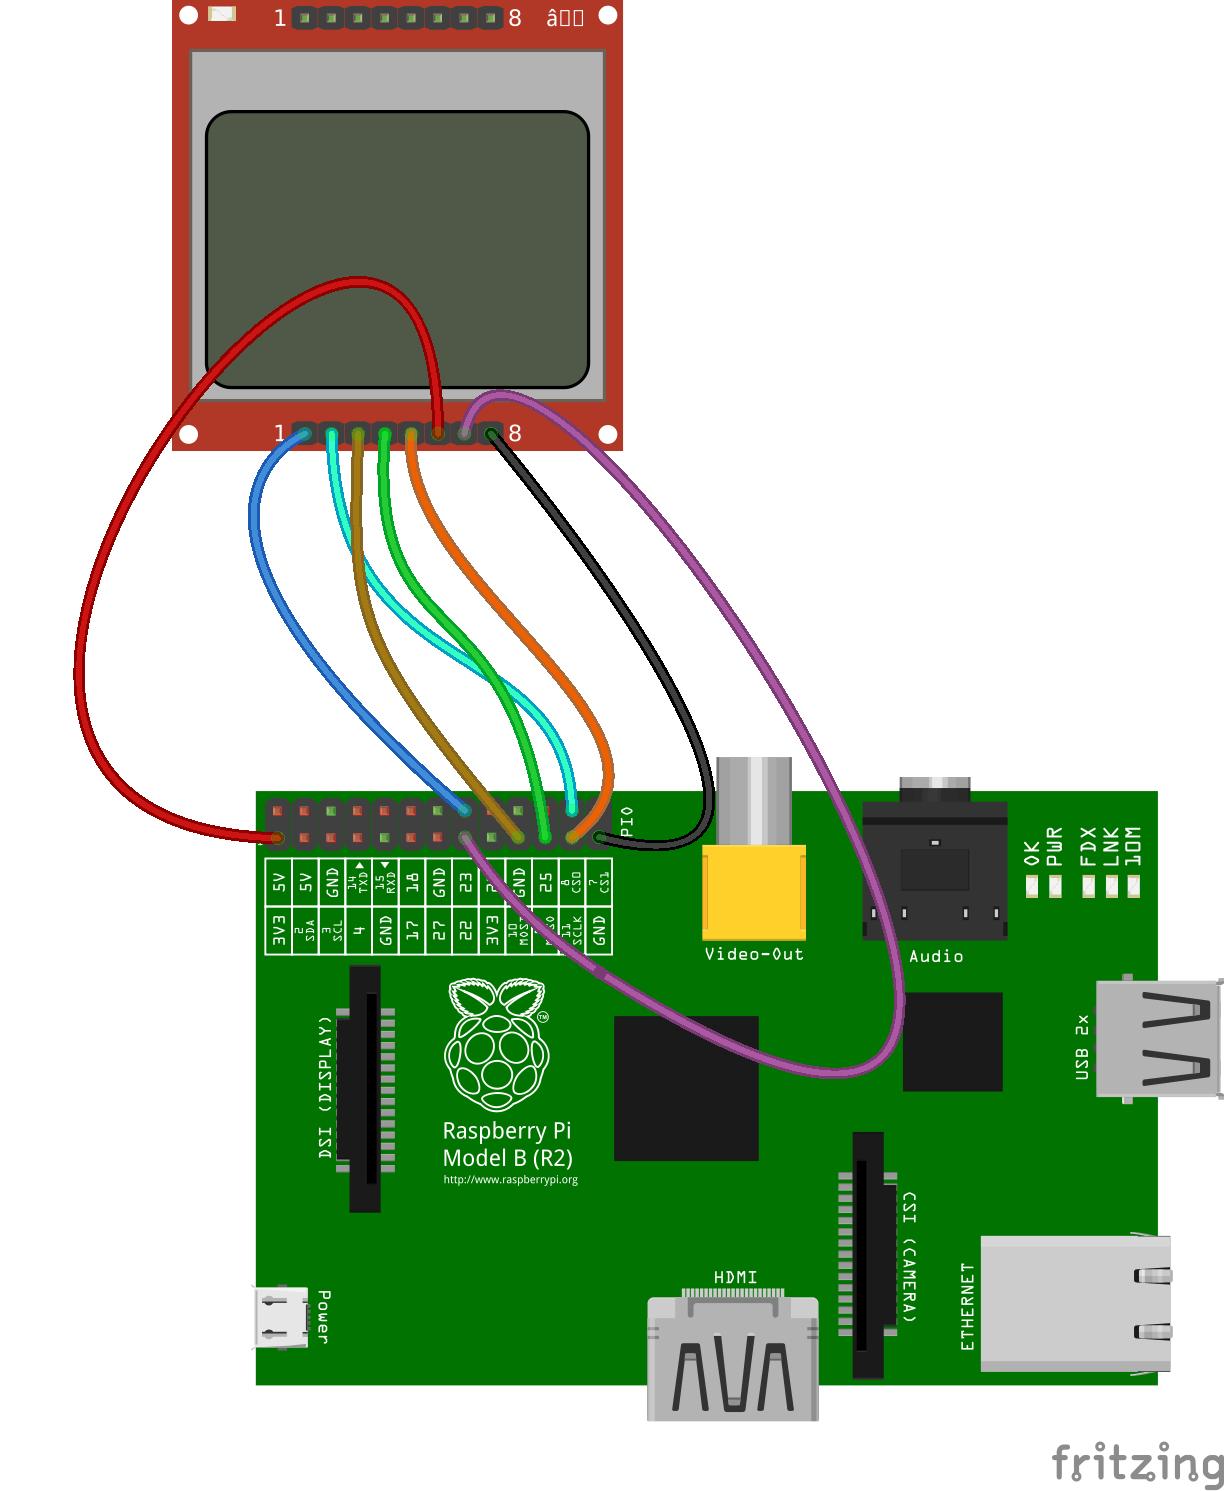 Interface Nokia 5110 LCD and Raspberry Pi – Python 19